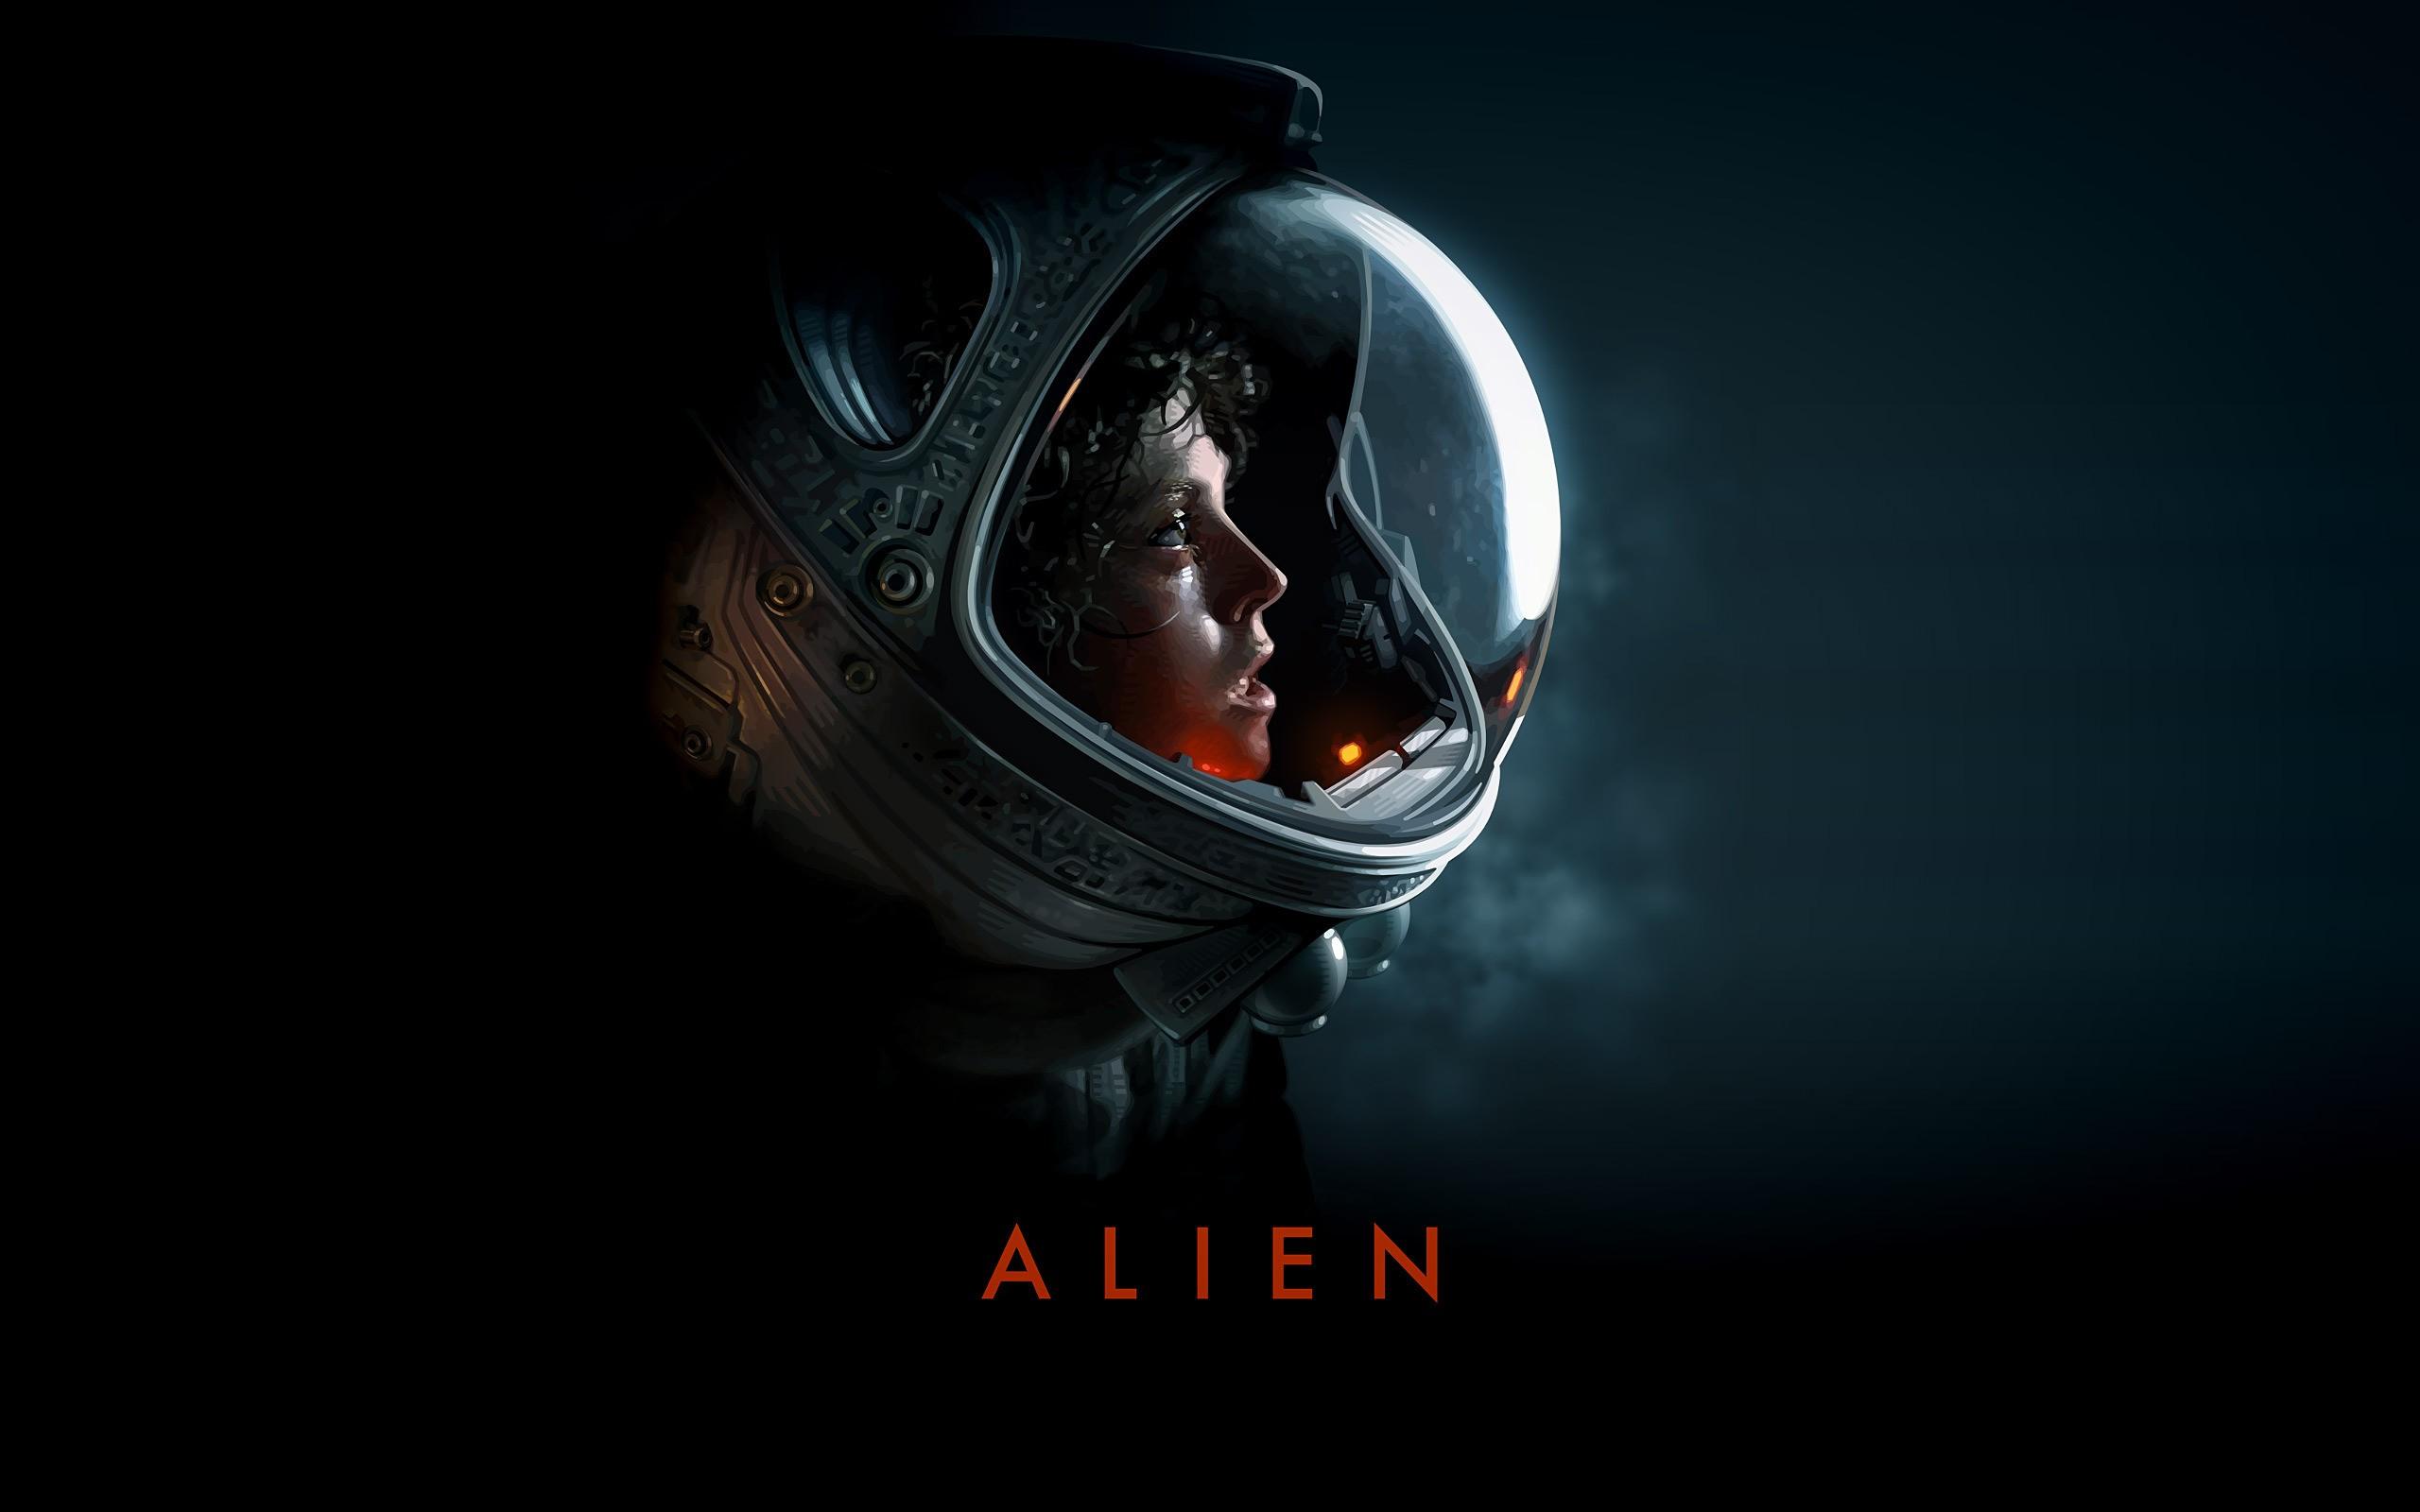 General 2560x1600 aliens Alien (movie) Sigourney Weaver Ellen Ripley artwork science fiction space suit movies horror